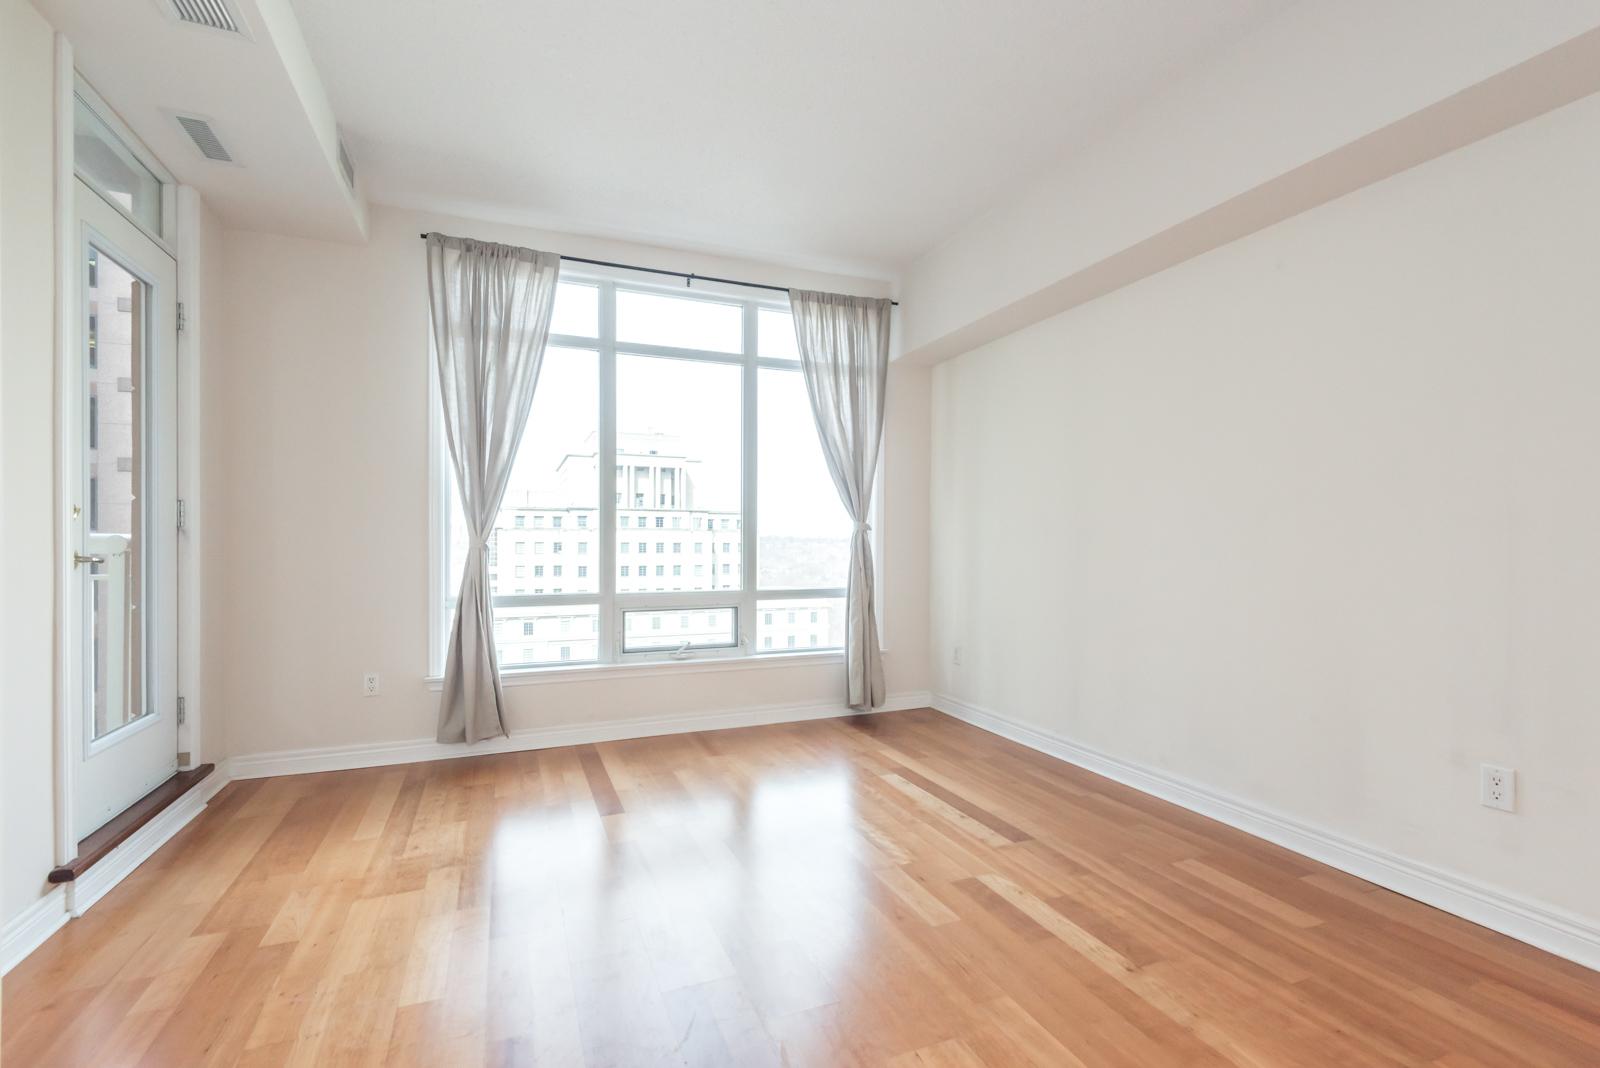 Photo of 100 Hayden Street interior